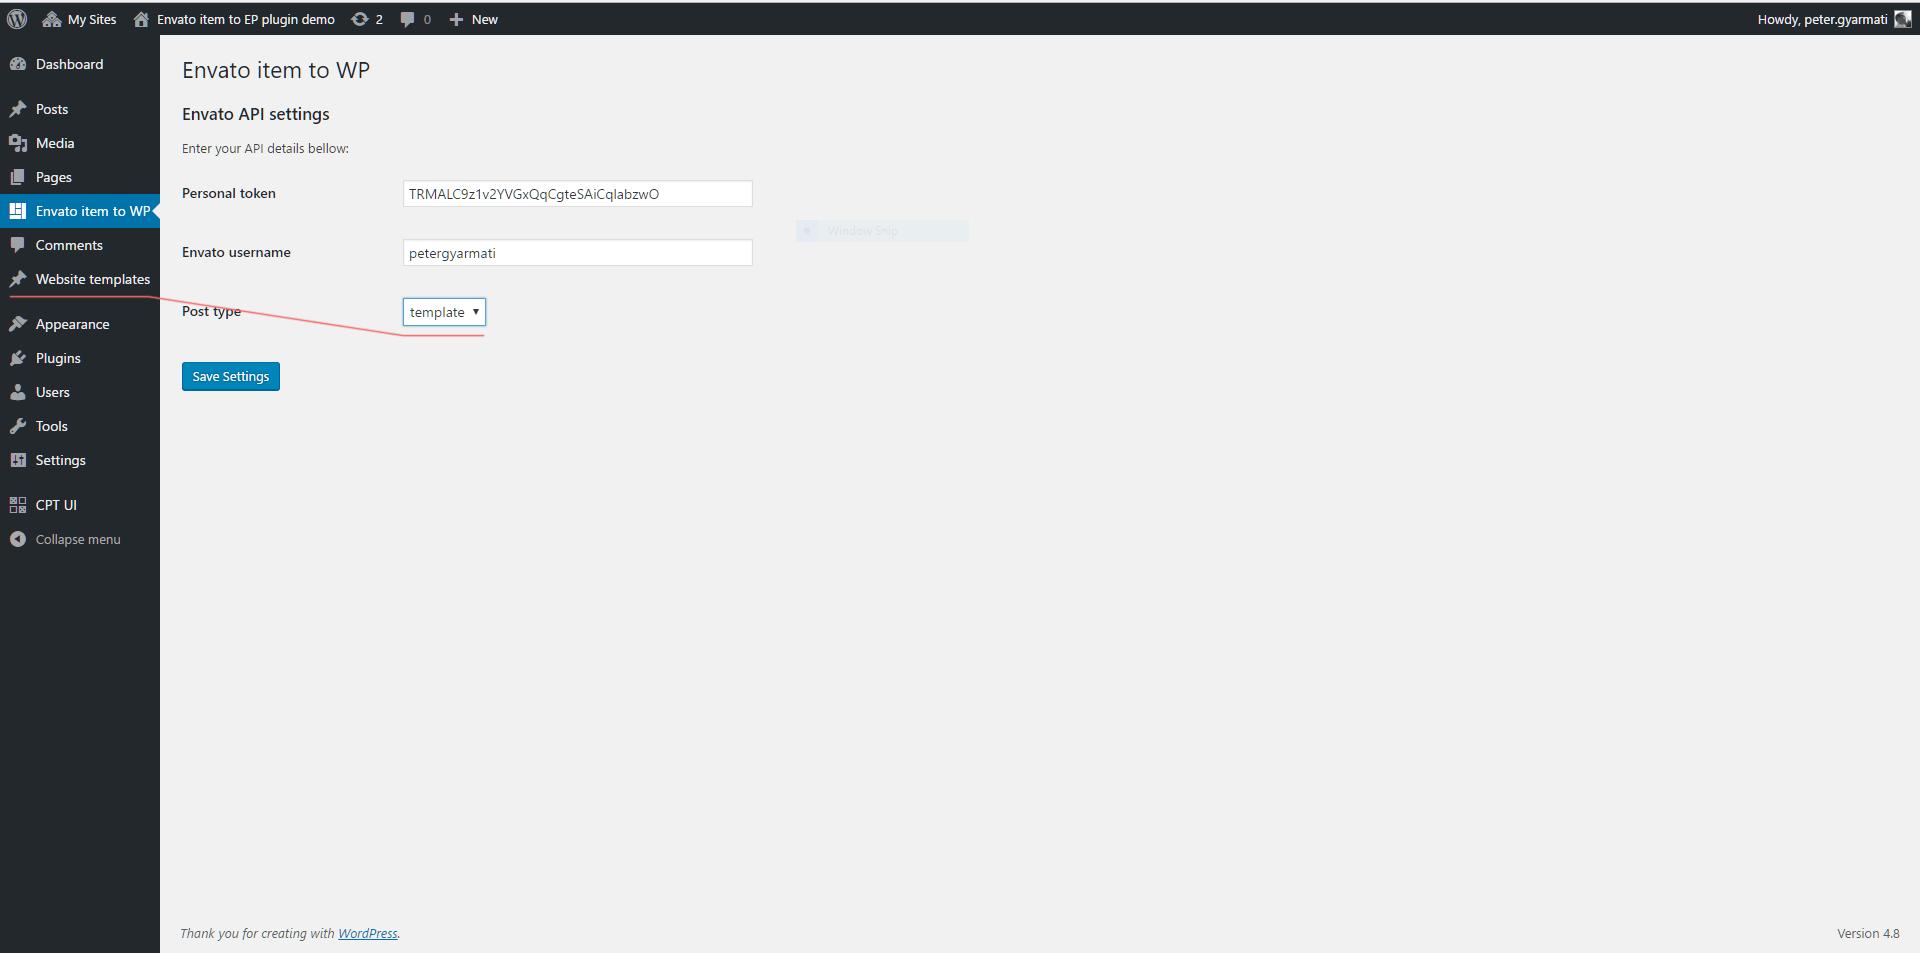 Envato item to WordPress options